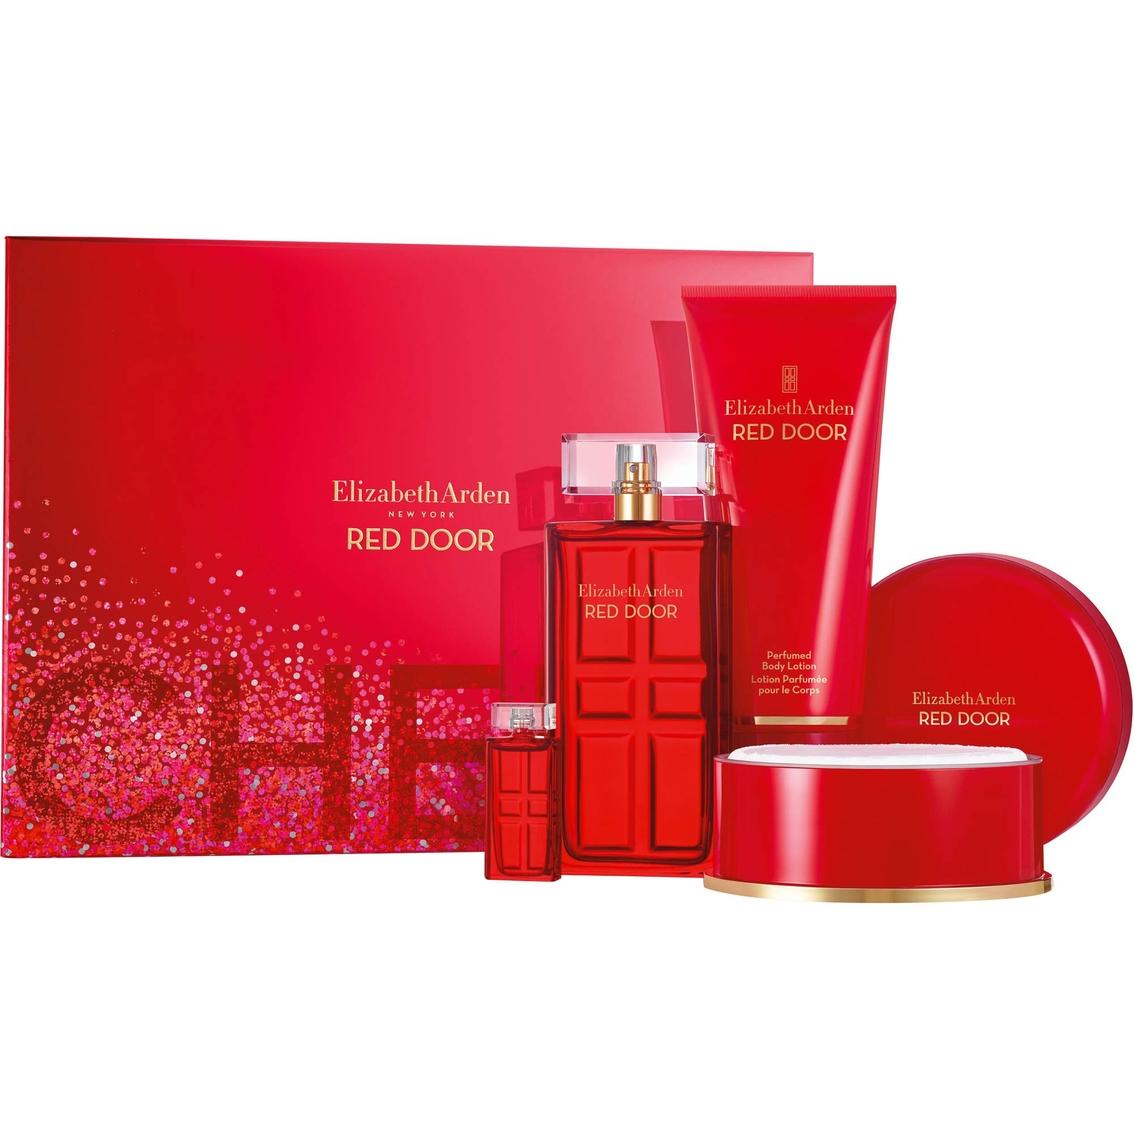 Elizabeth Arden Red Door 33 Oz Eau De Toilette Spray 4 Pc Gift